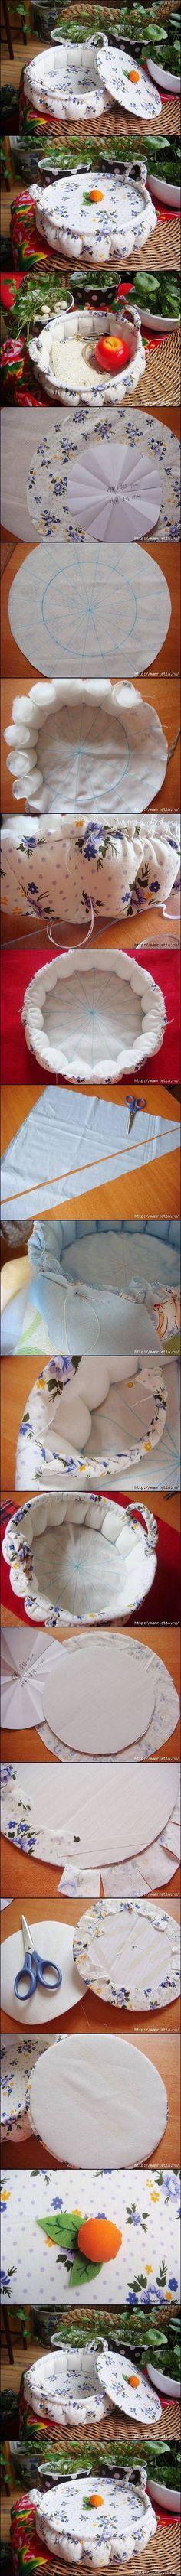 DIY Soft Fabric Needlework Basket